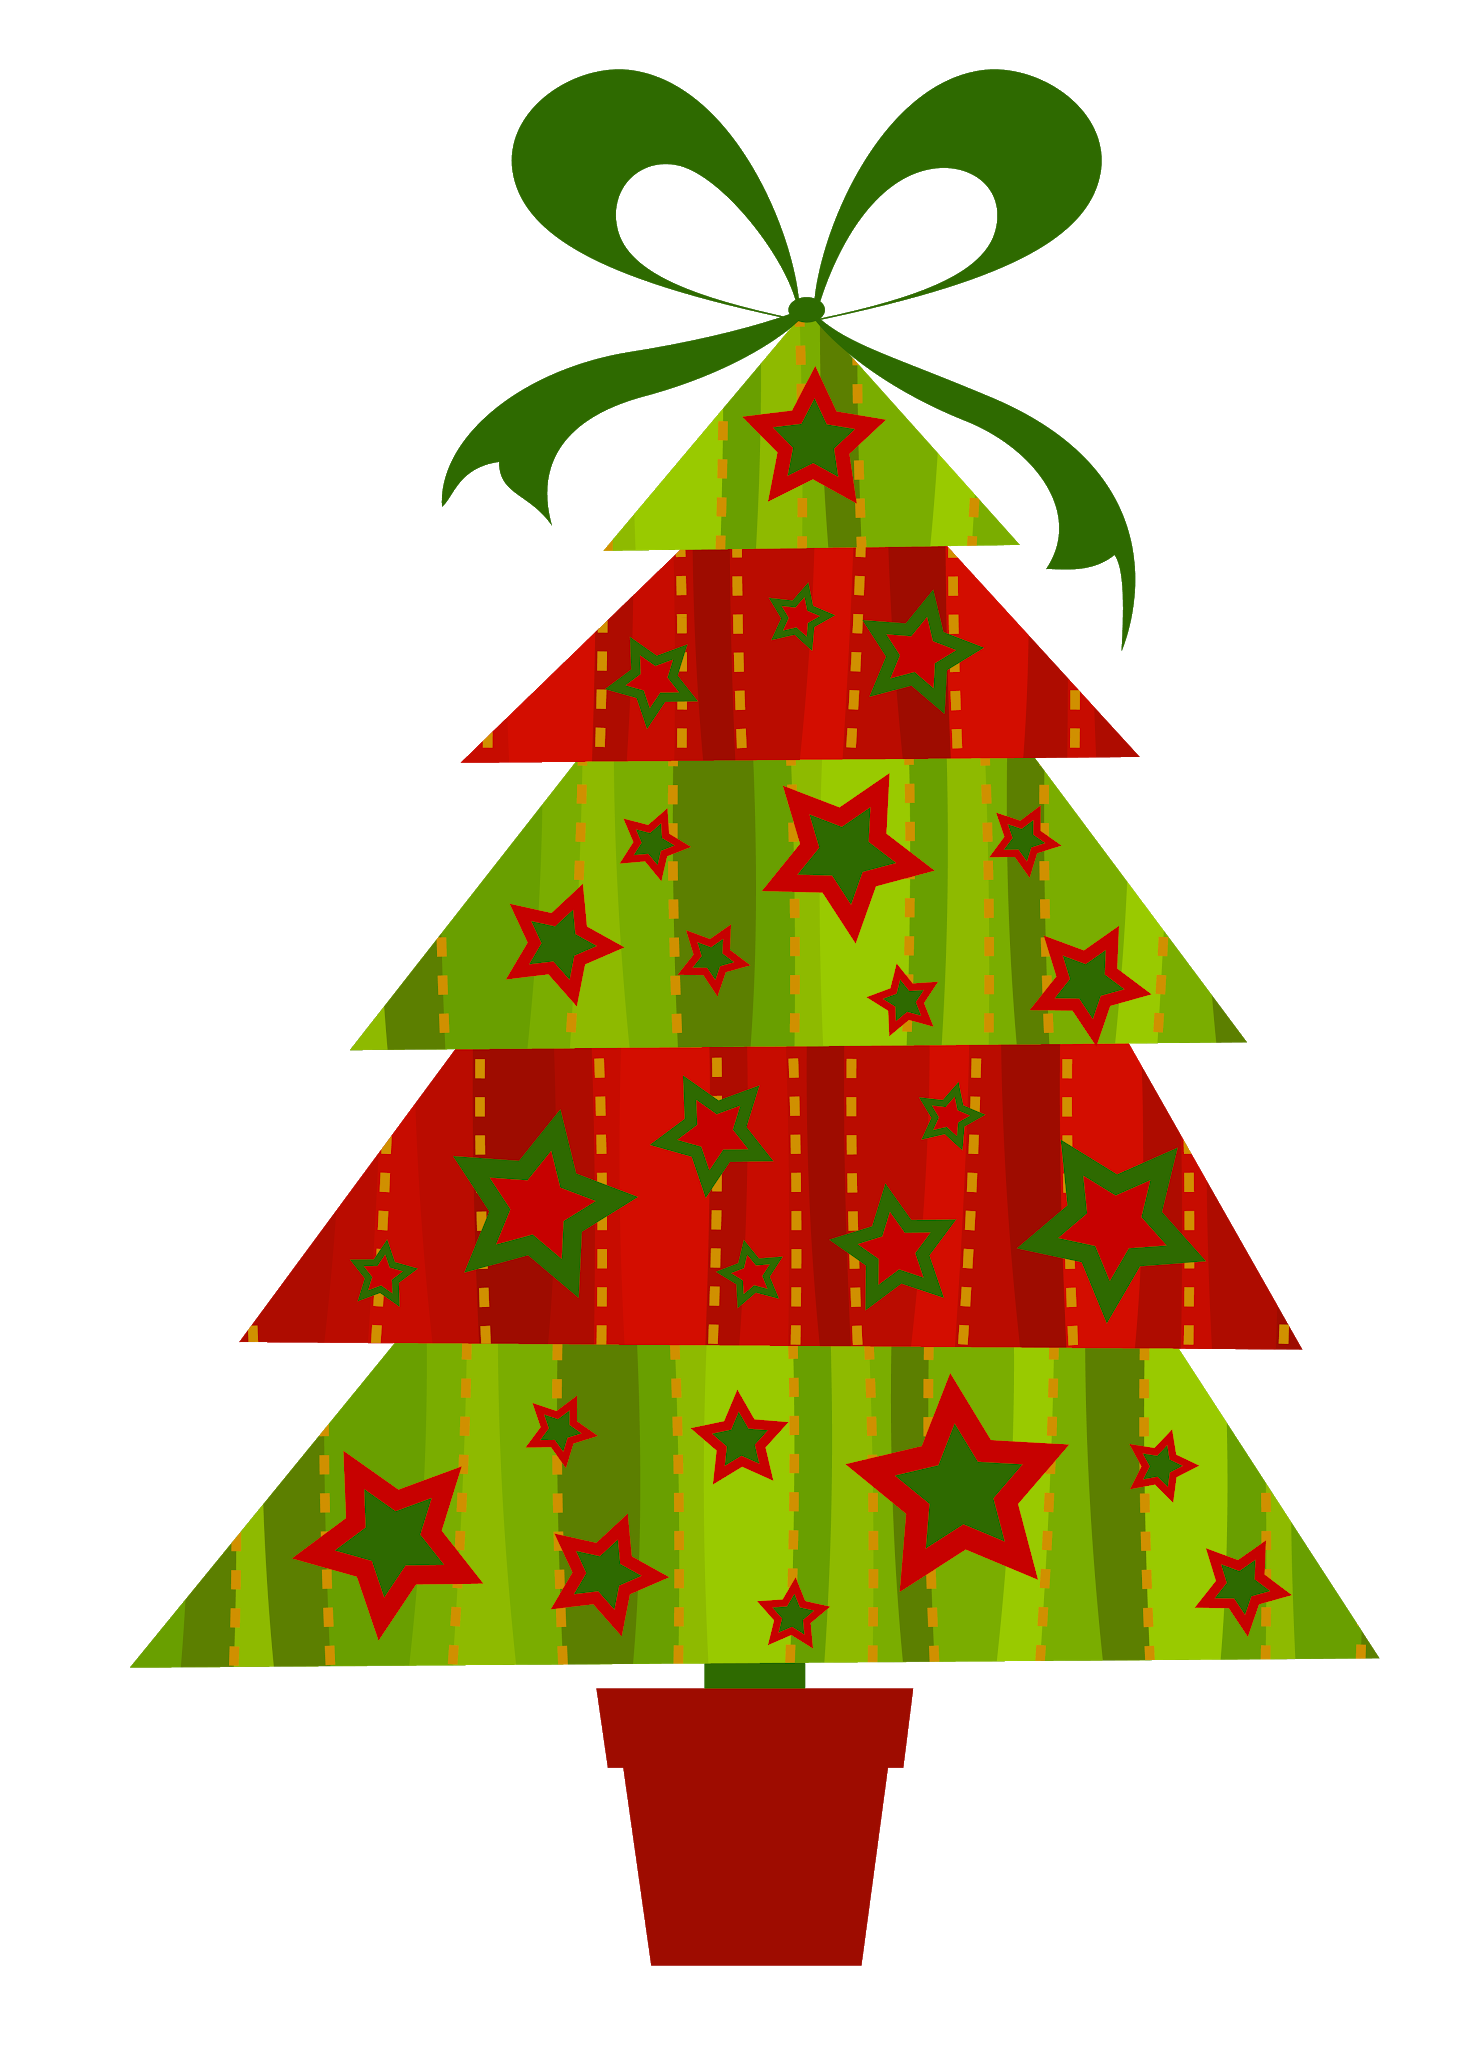 Christmas Tree Png Clipart Christmas Png Image Clipart Christmas Tree Images Modern Christmas Tree Christmas Tree Clipart